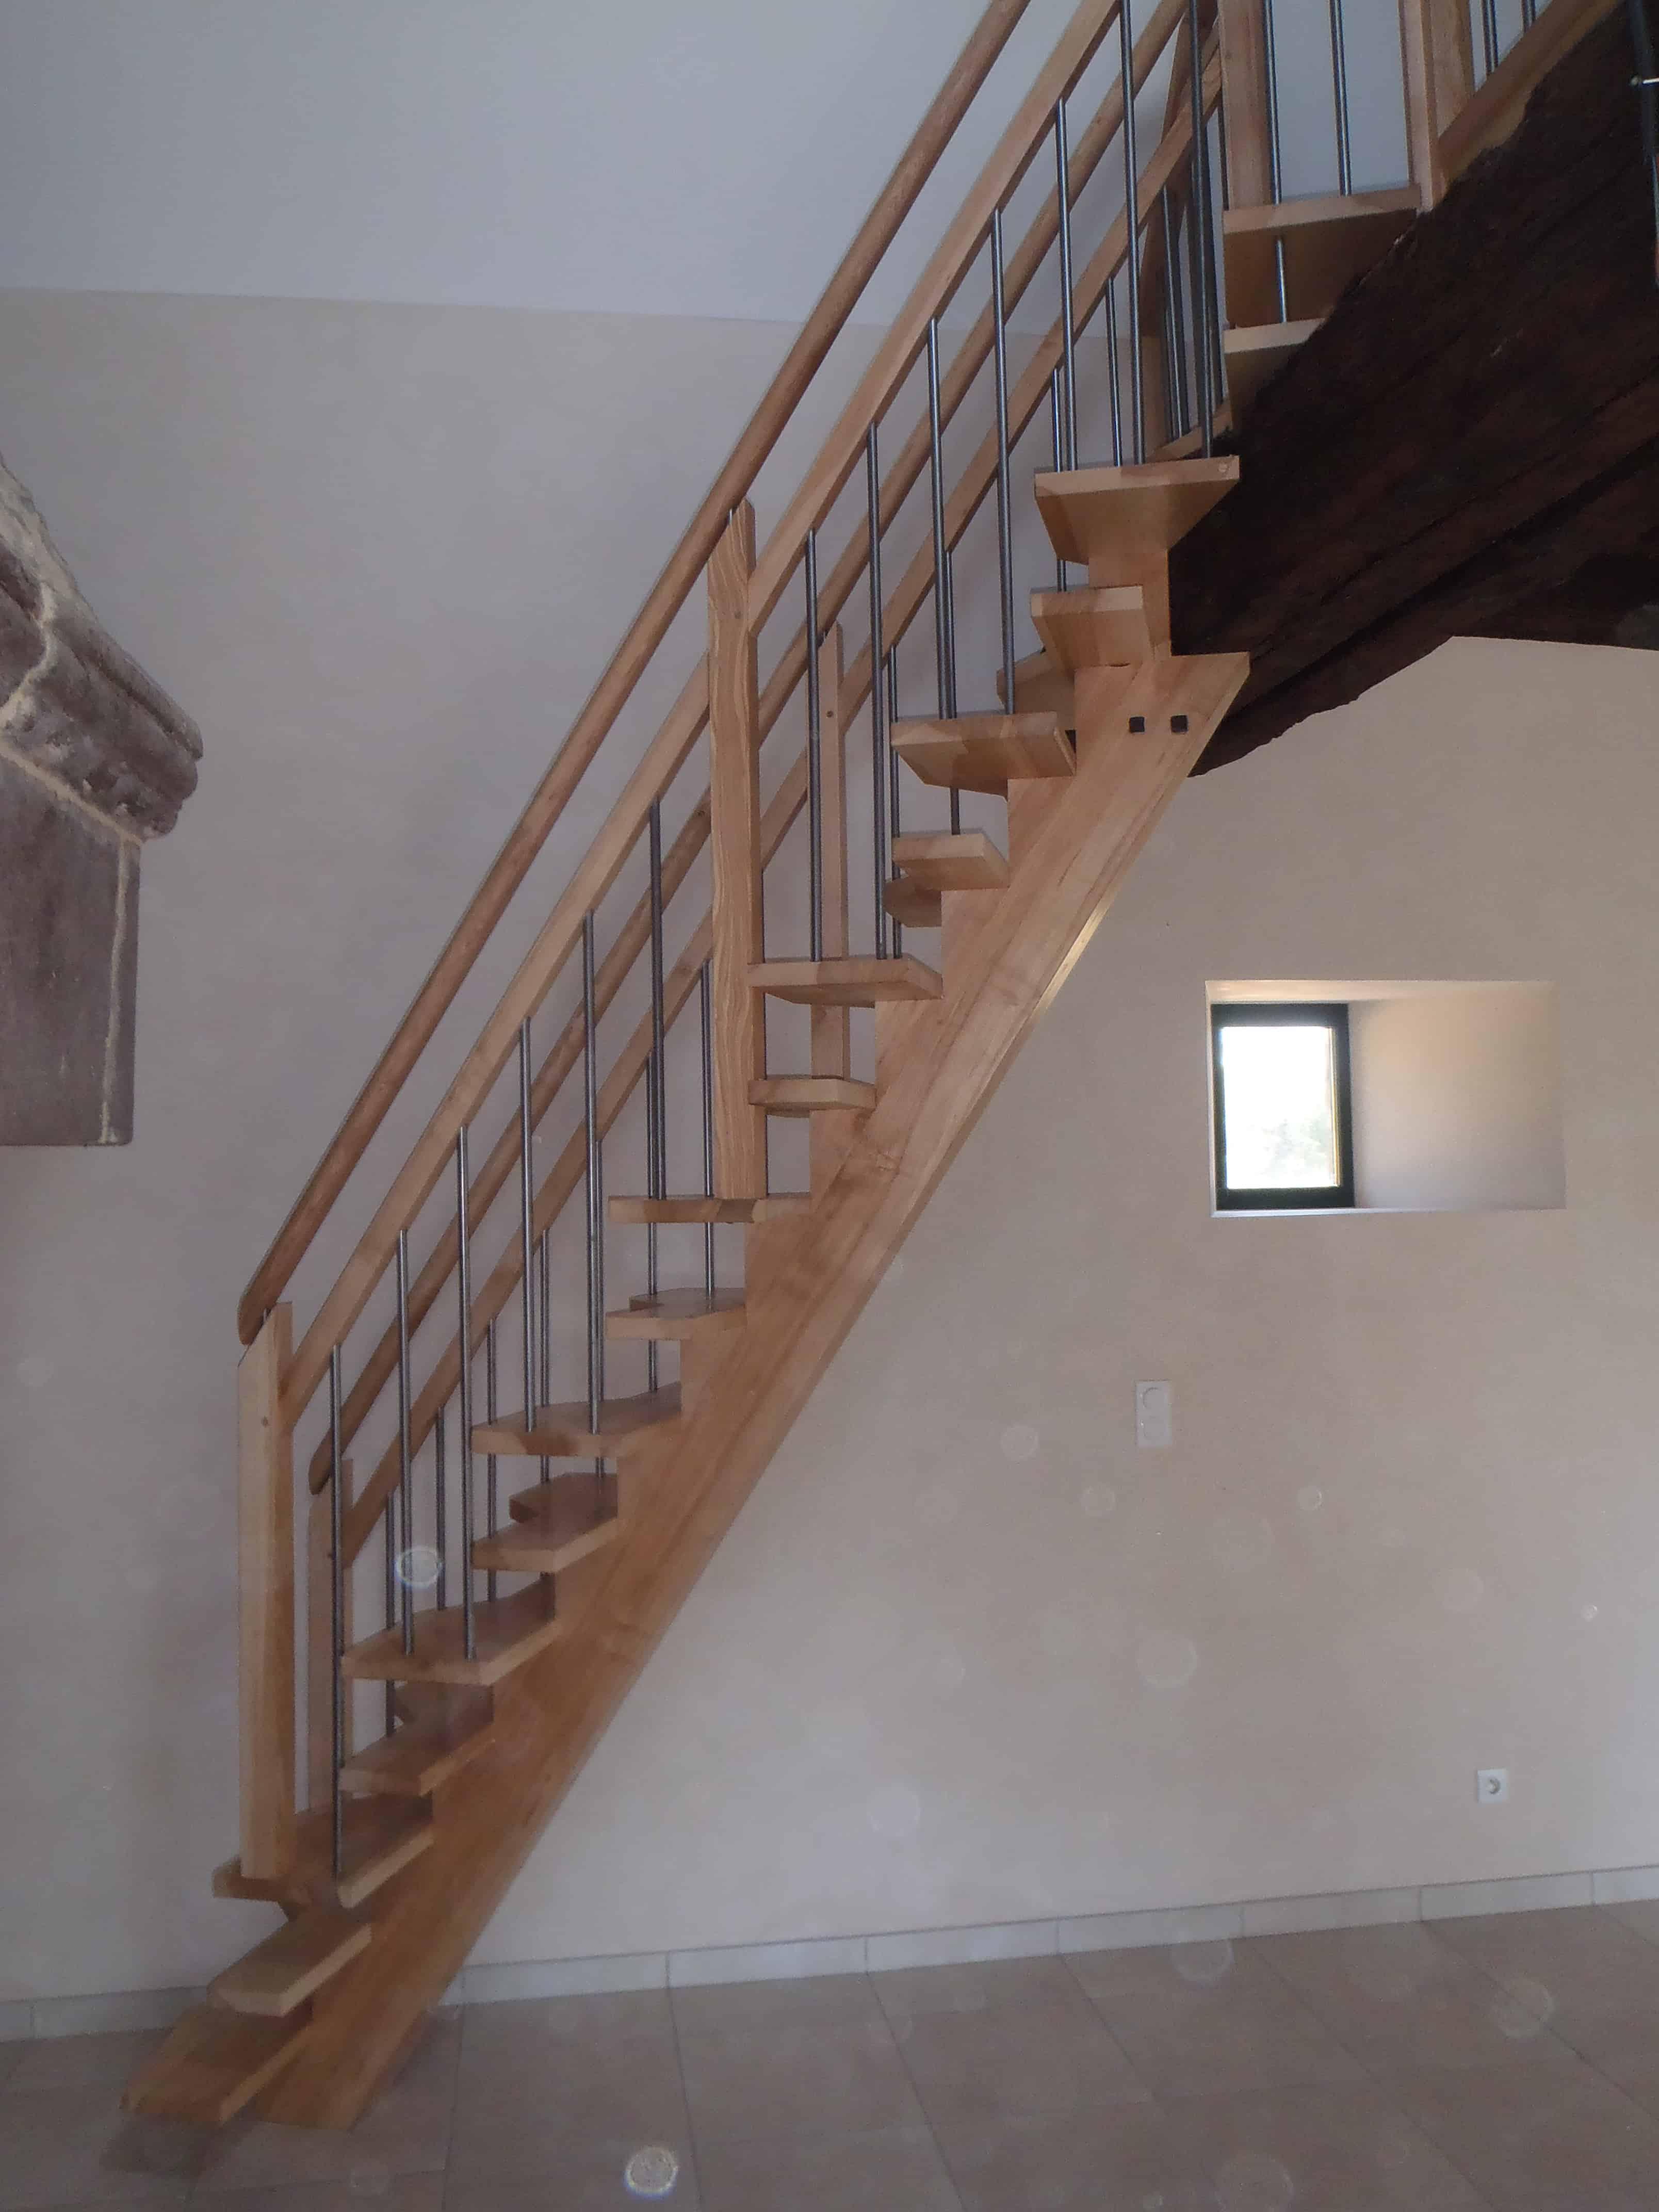 fabrication escalier sur mesure menuiserie bg d billard moderne. Black Bedroom Furniture Sets. Home Design Ideas